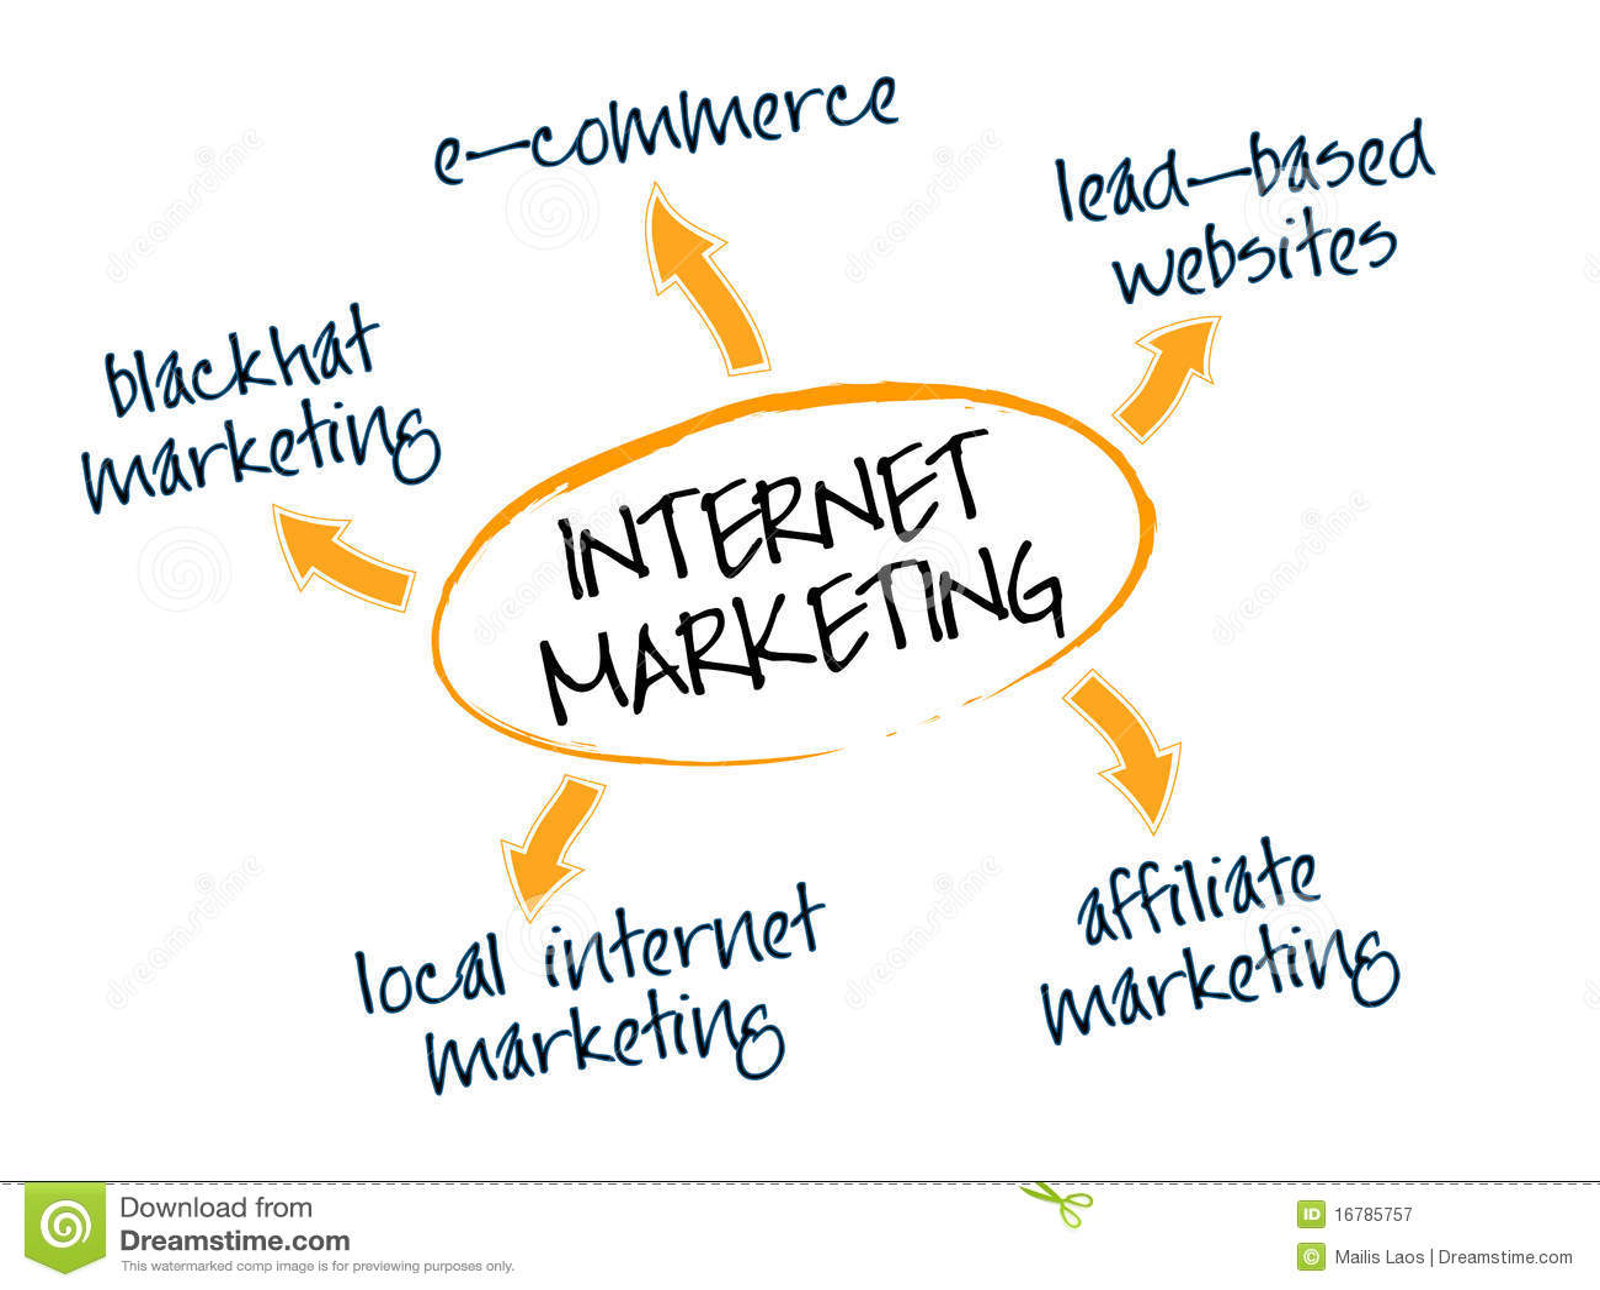 internet-marketing-16785757.jpg